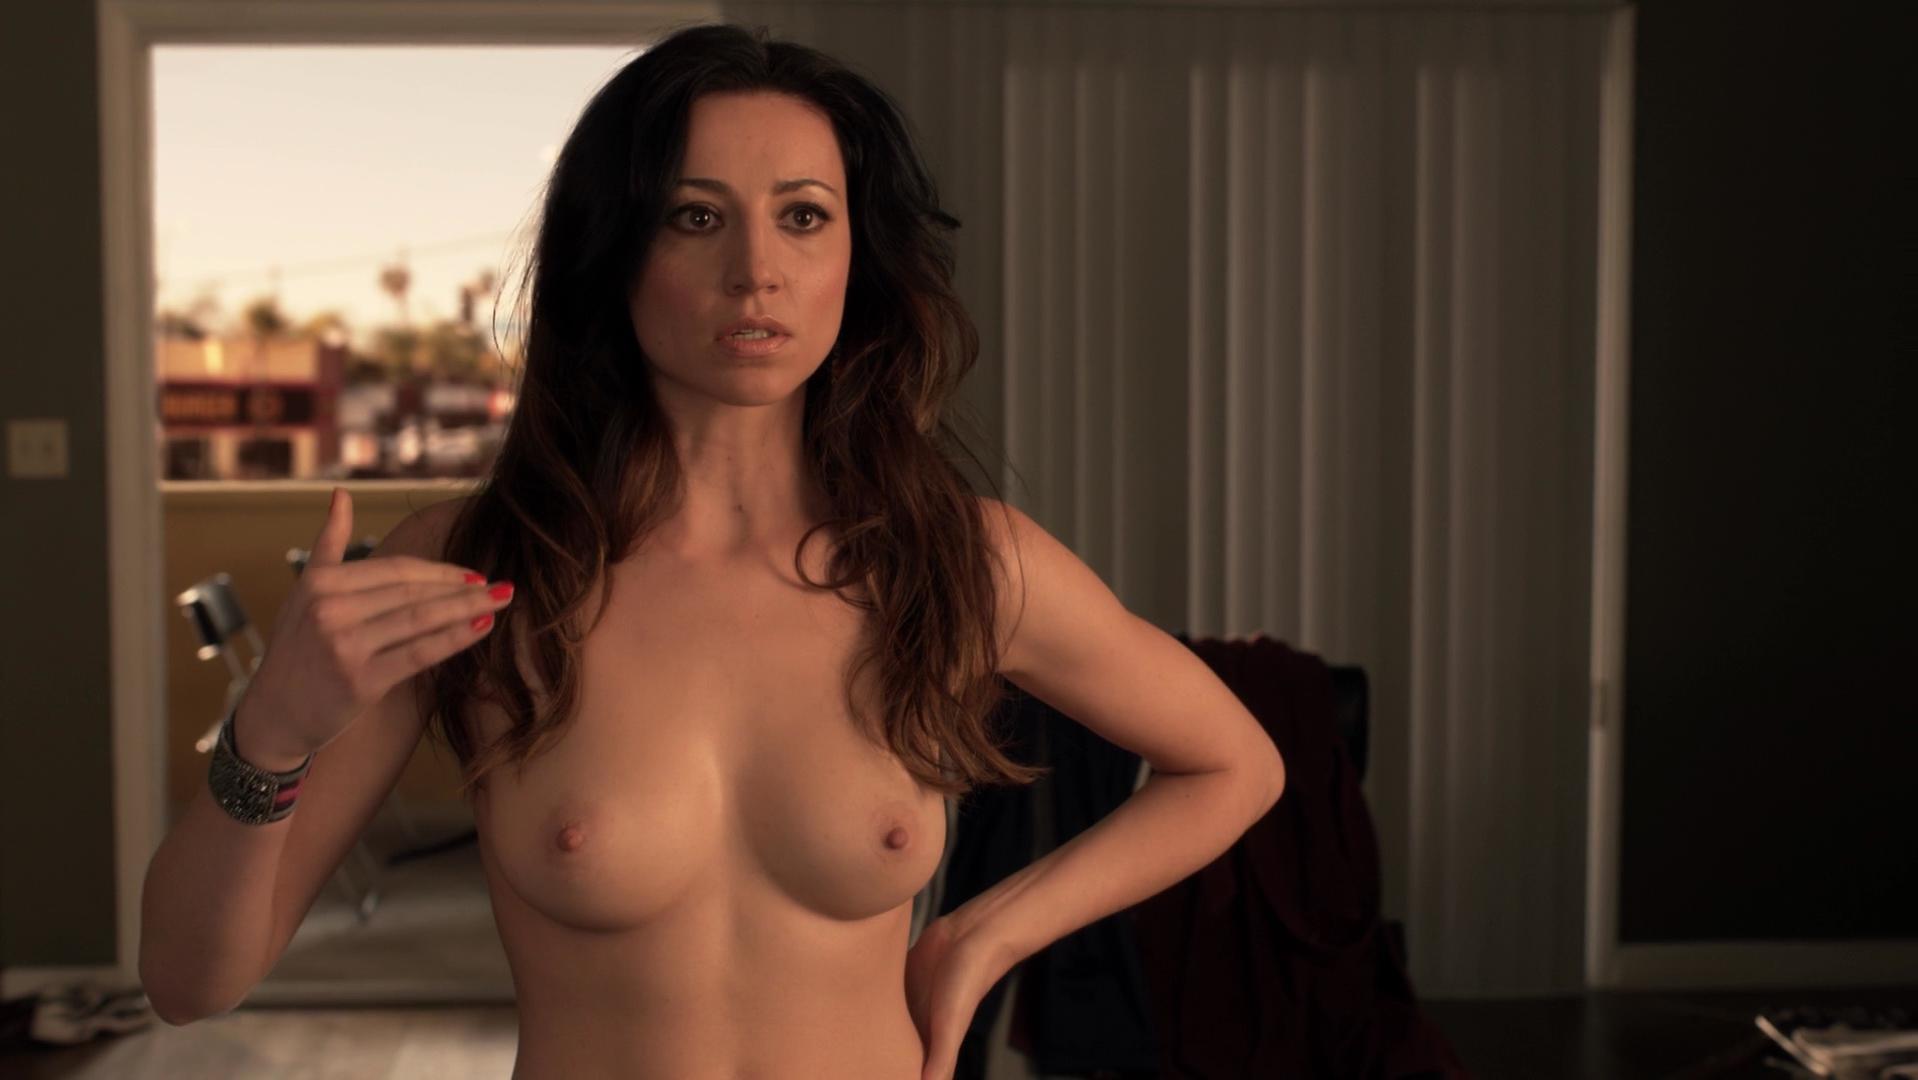 Christy Williams nude - Ray Donovan s03e03 (2015)